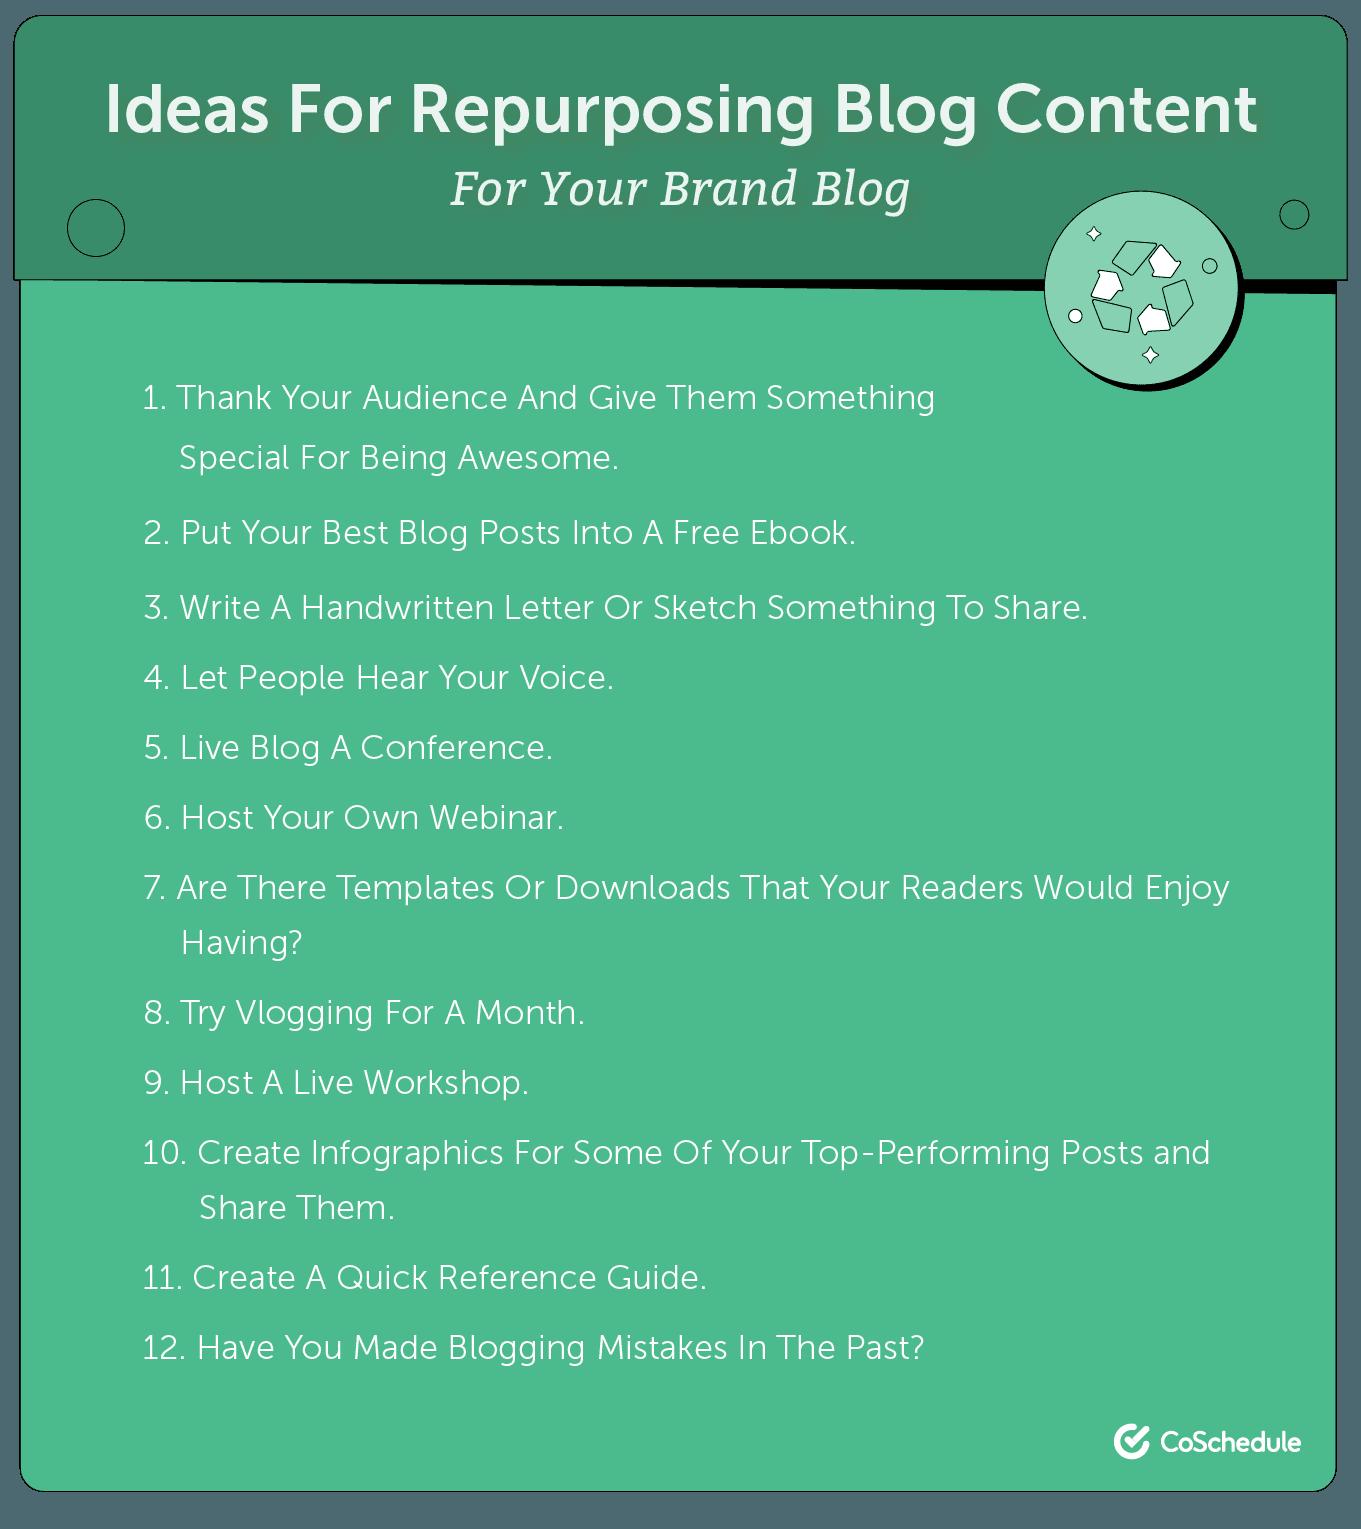 Ideas for repurposing your blog content.